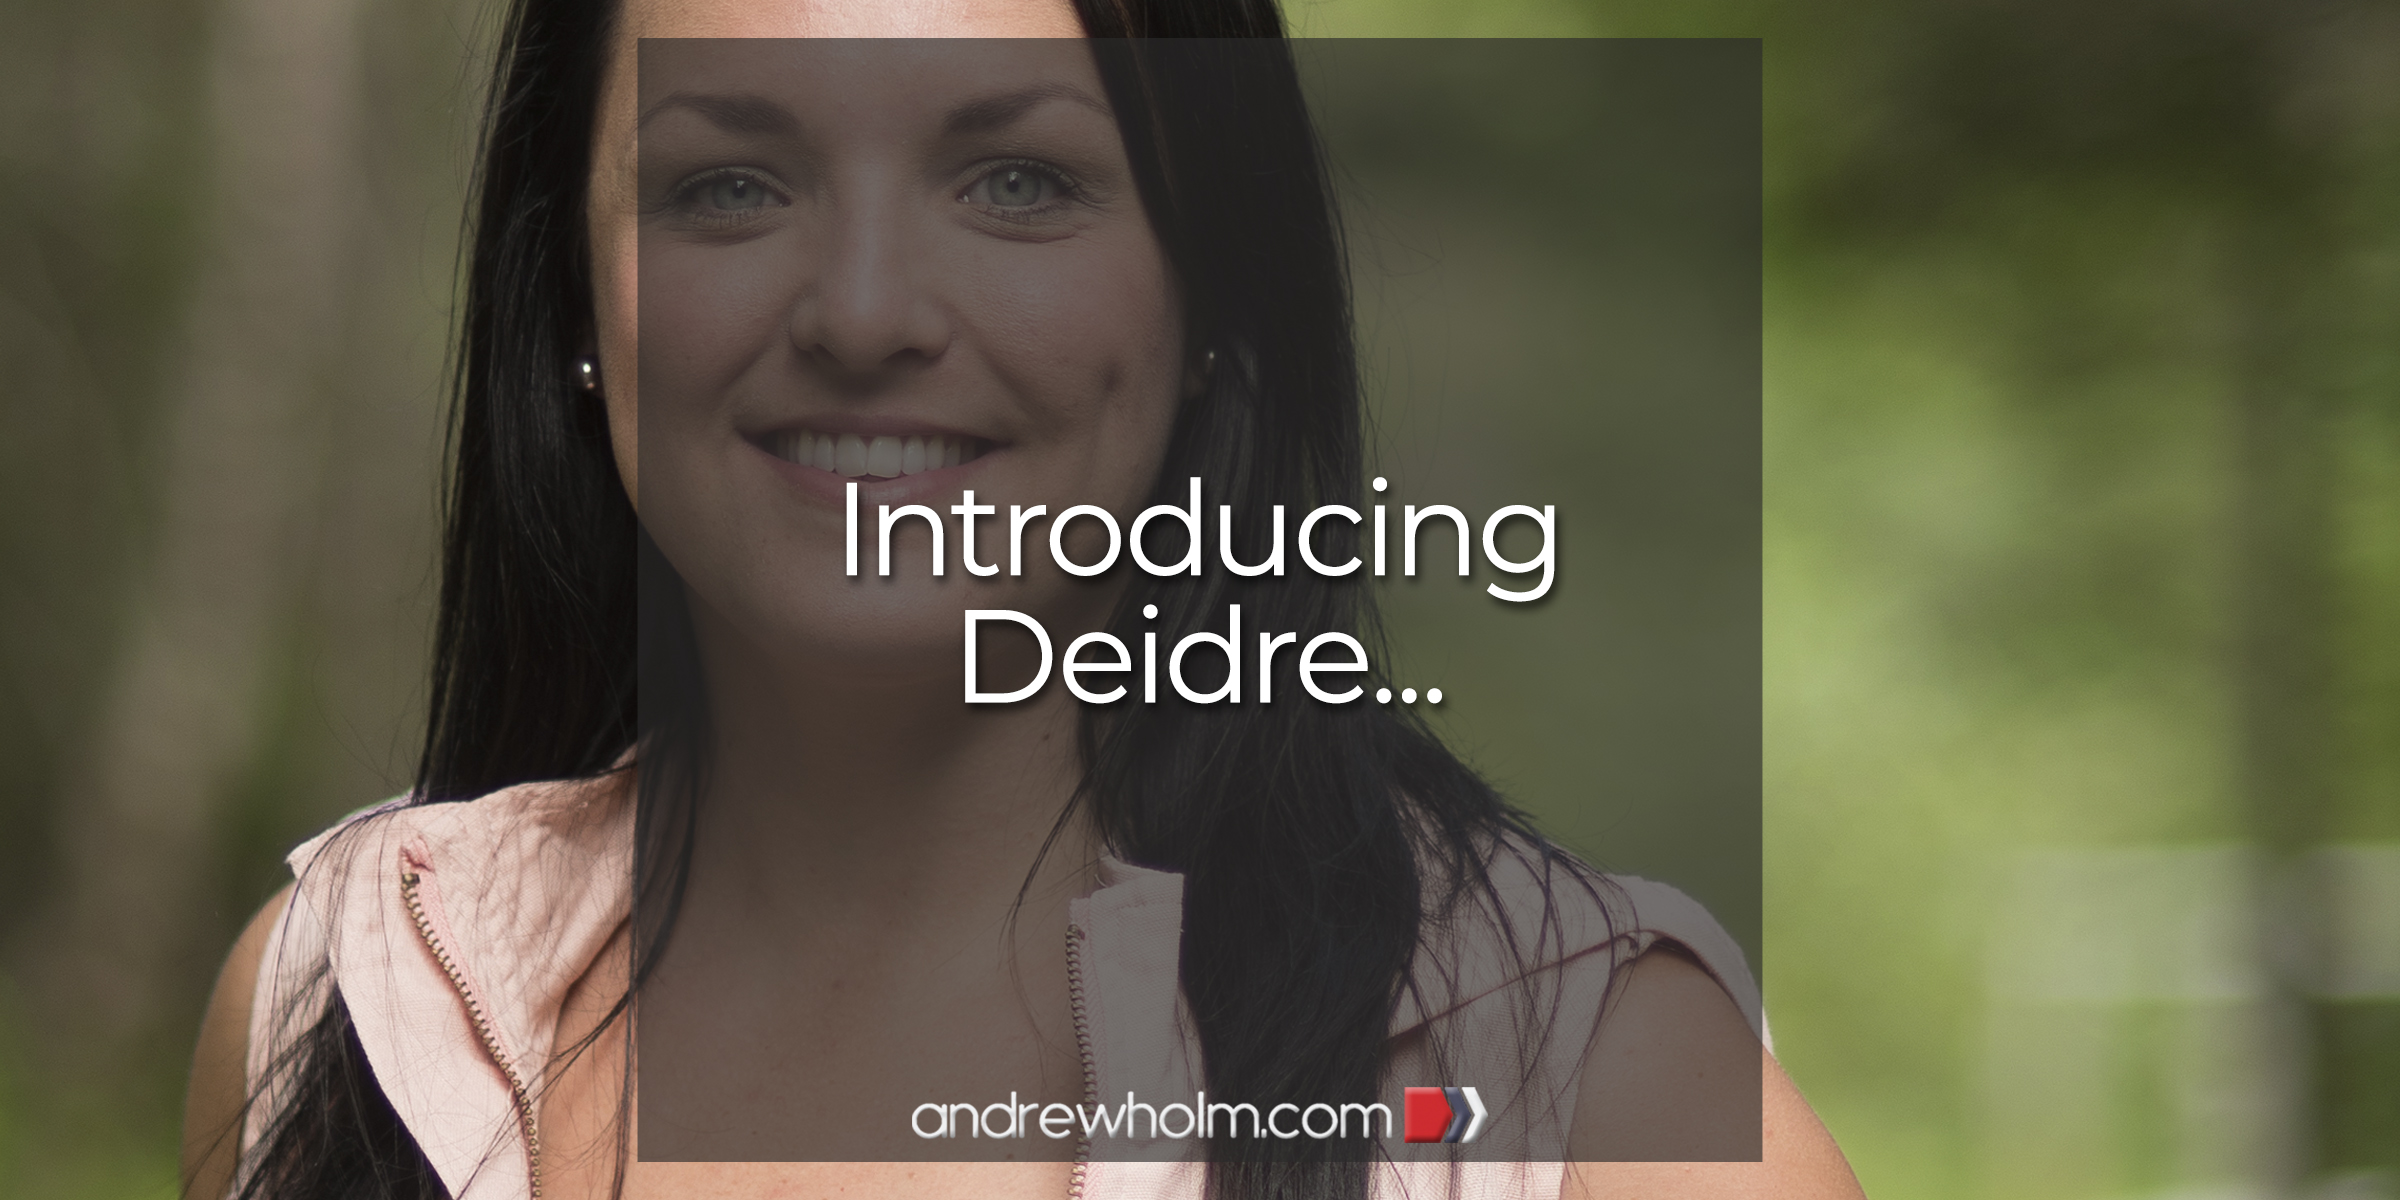 Introducing Deidre